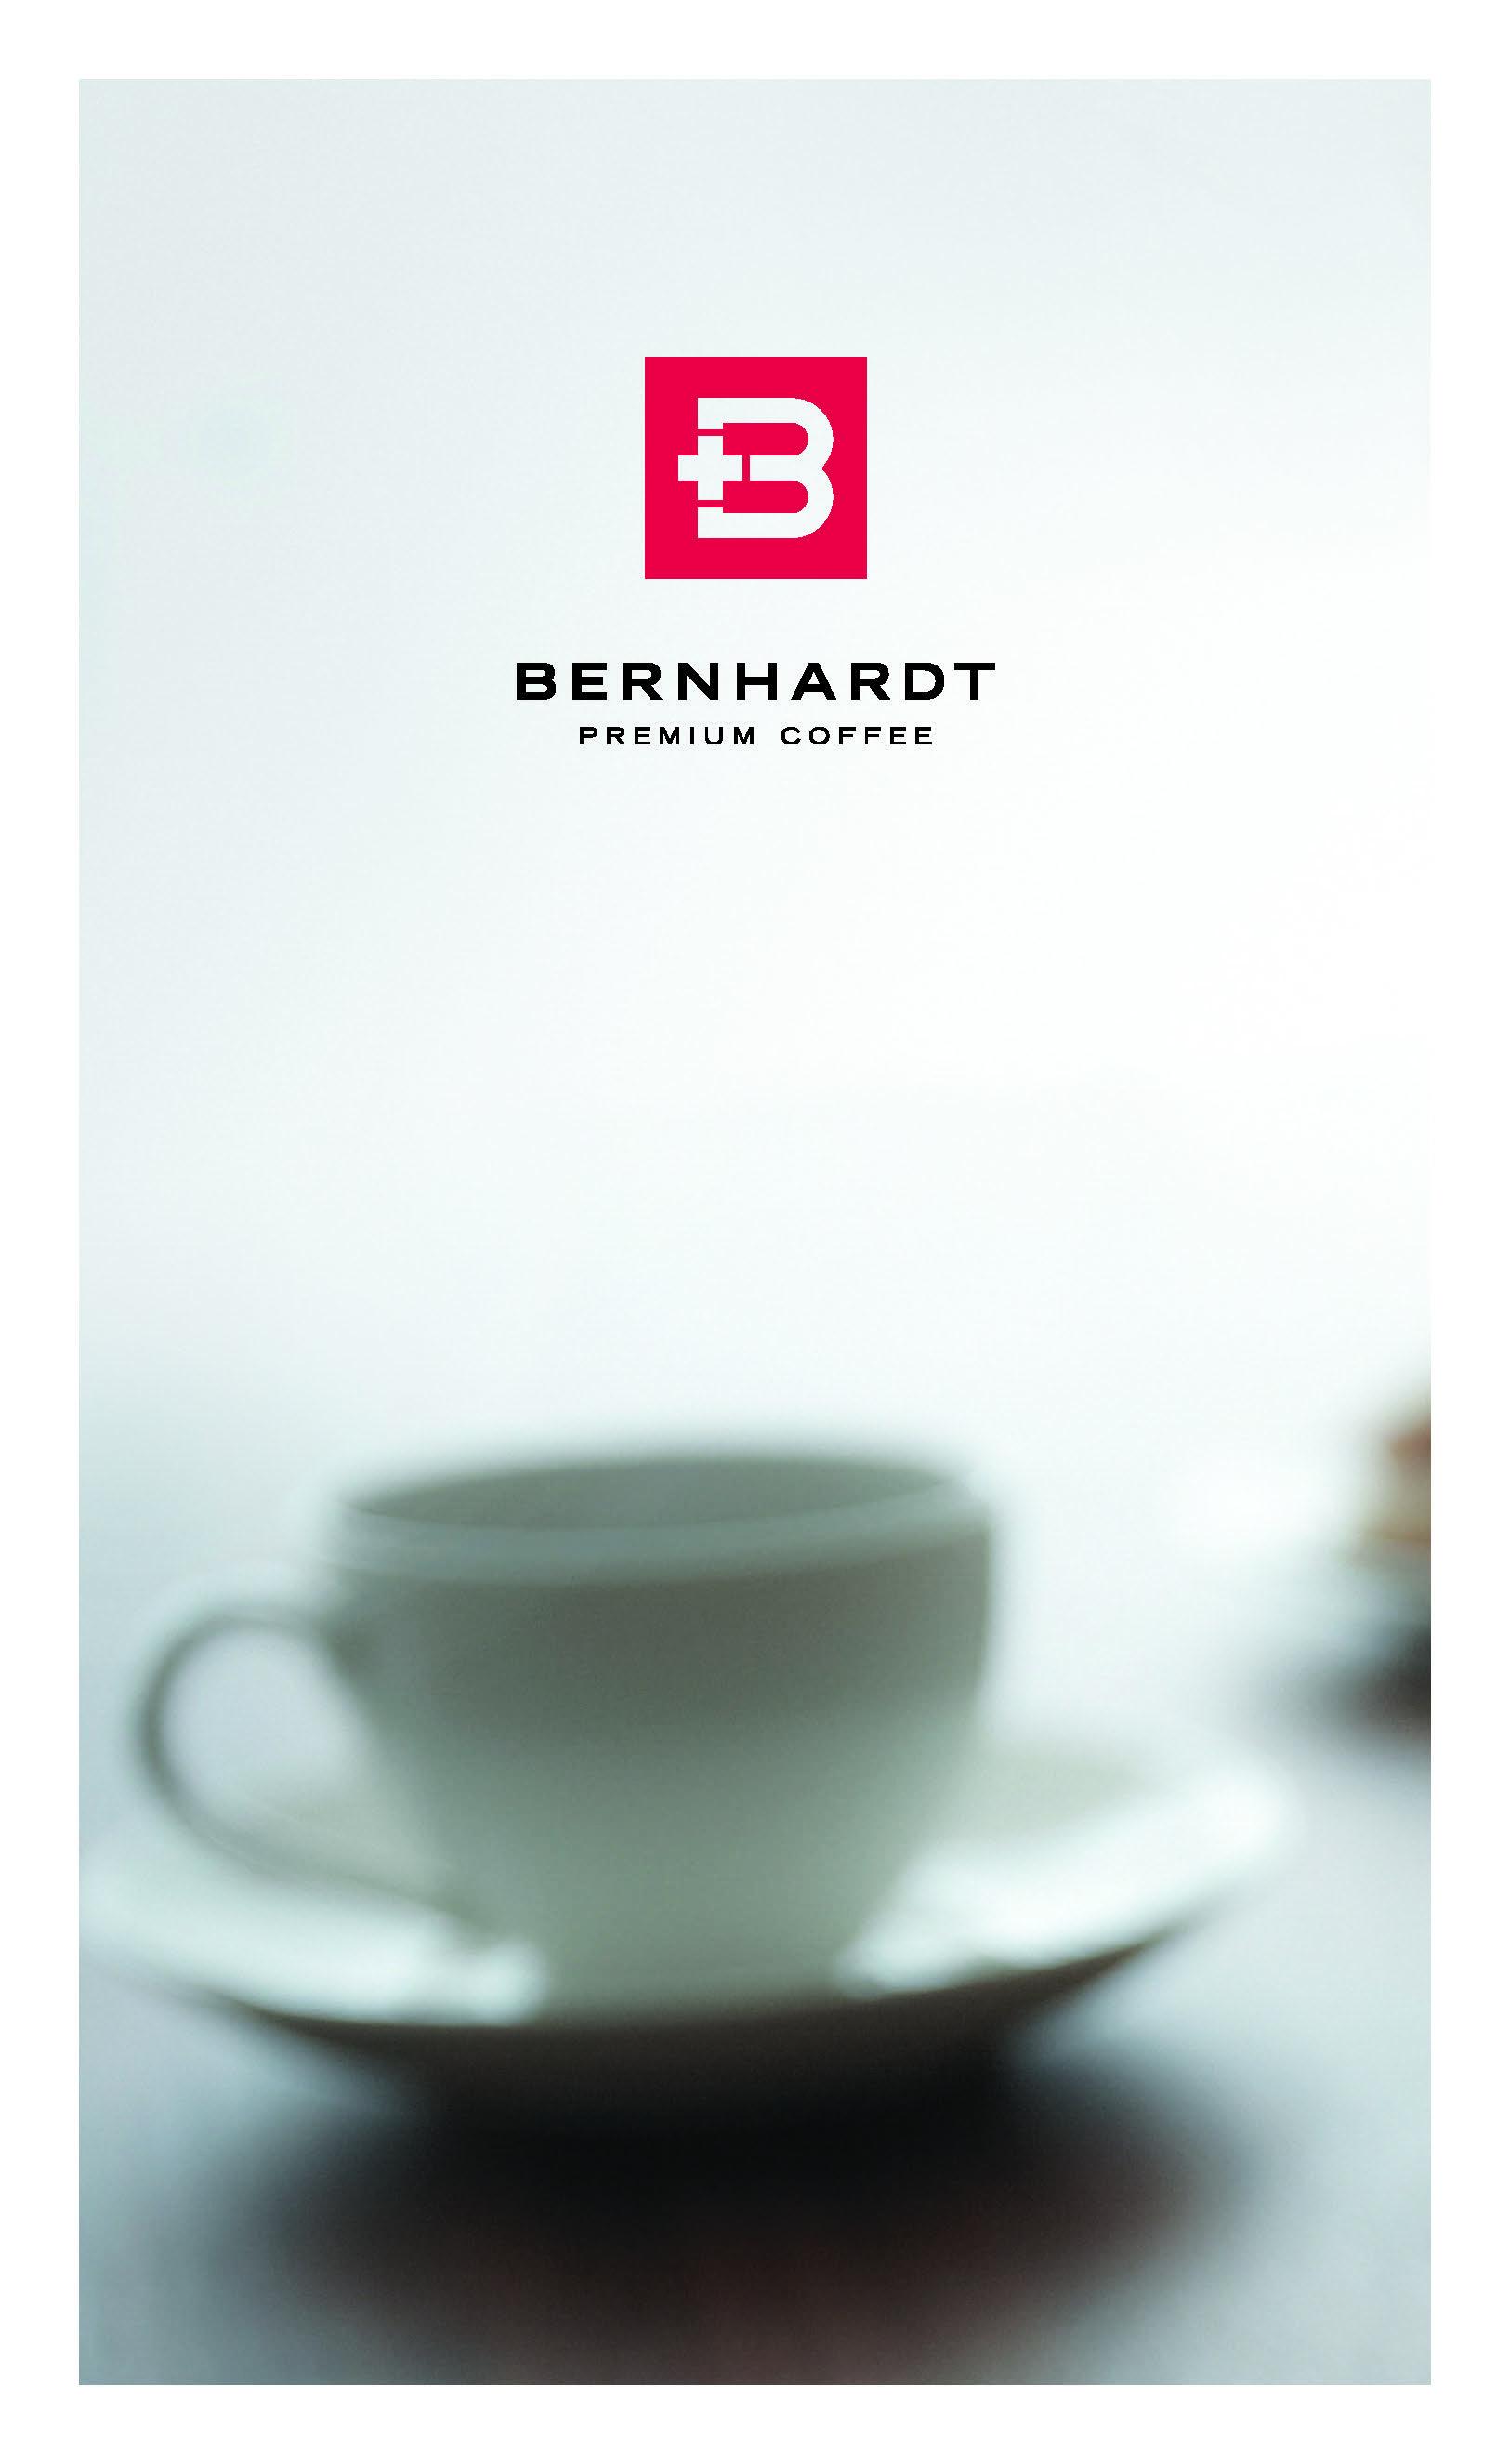 Bernhardt Coffee